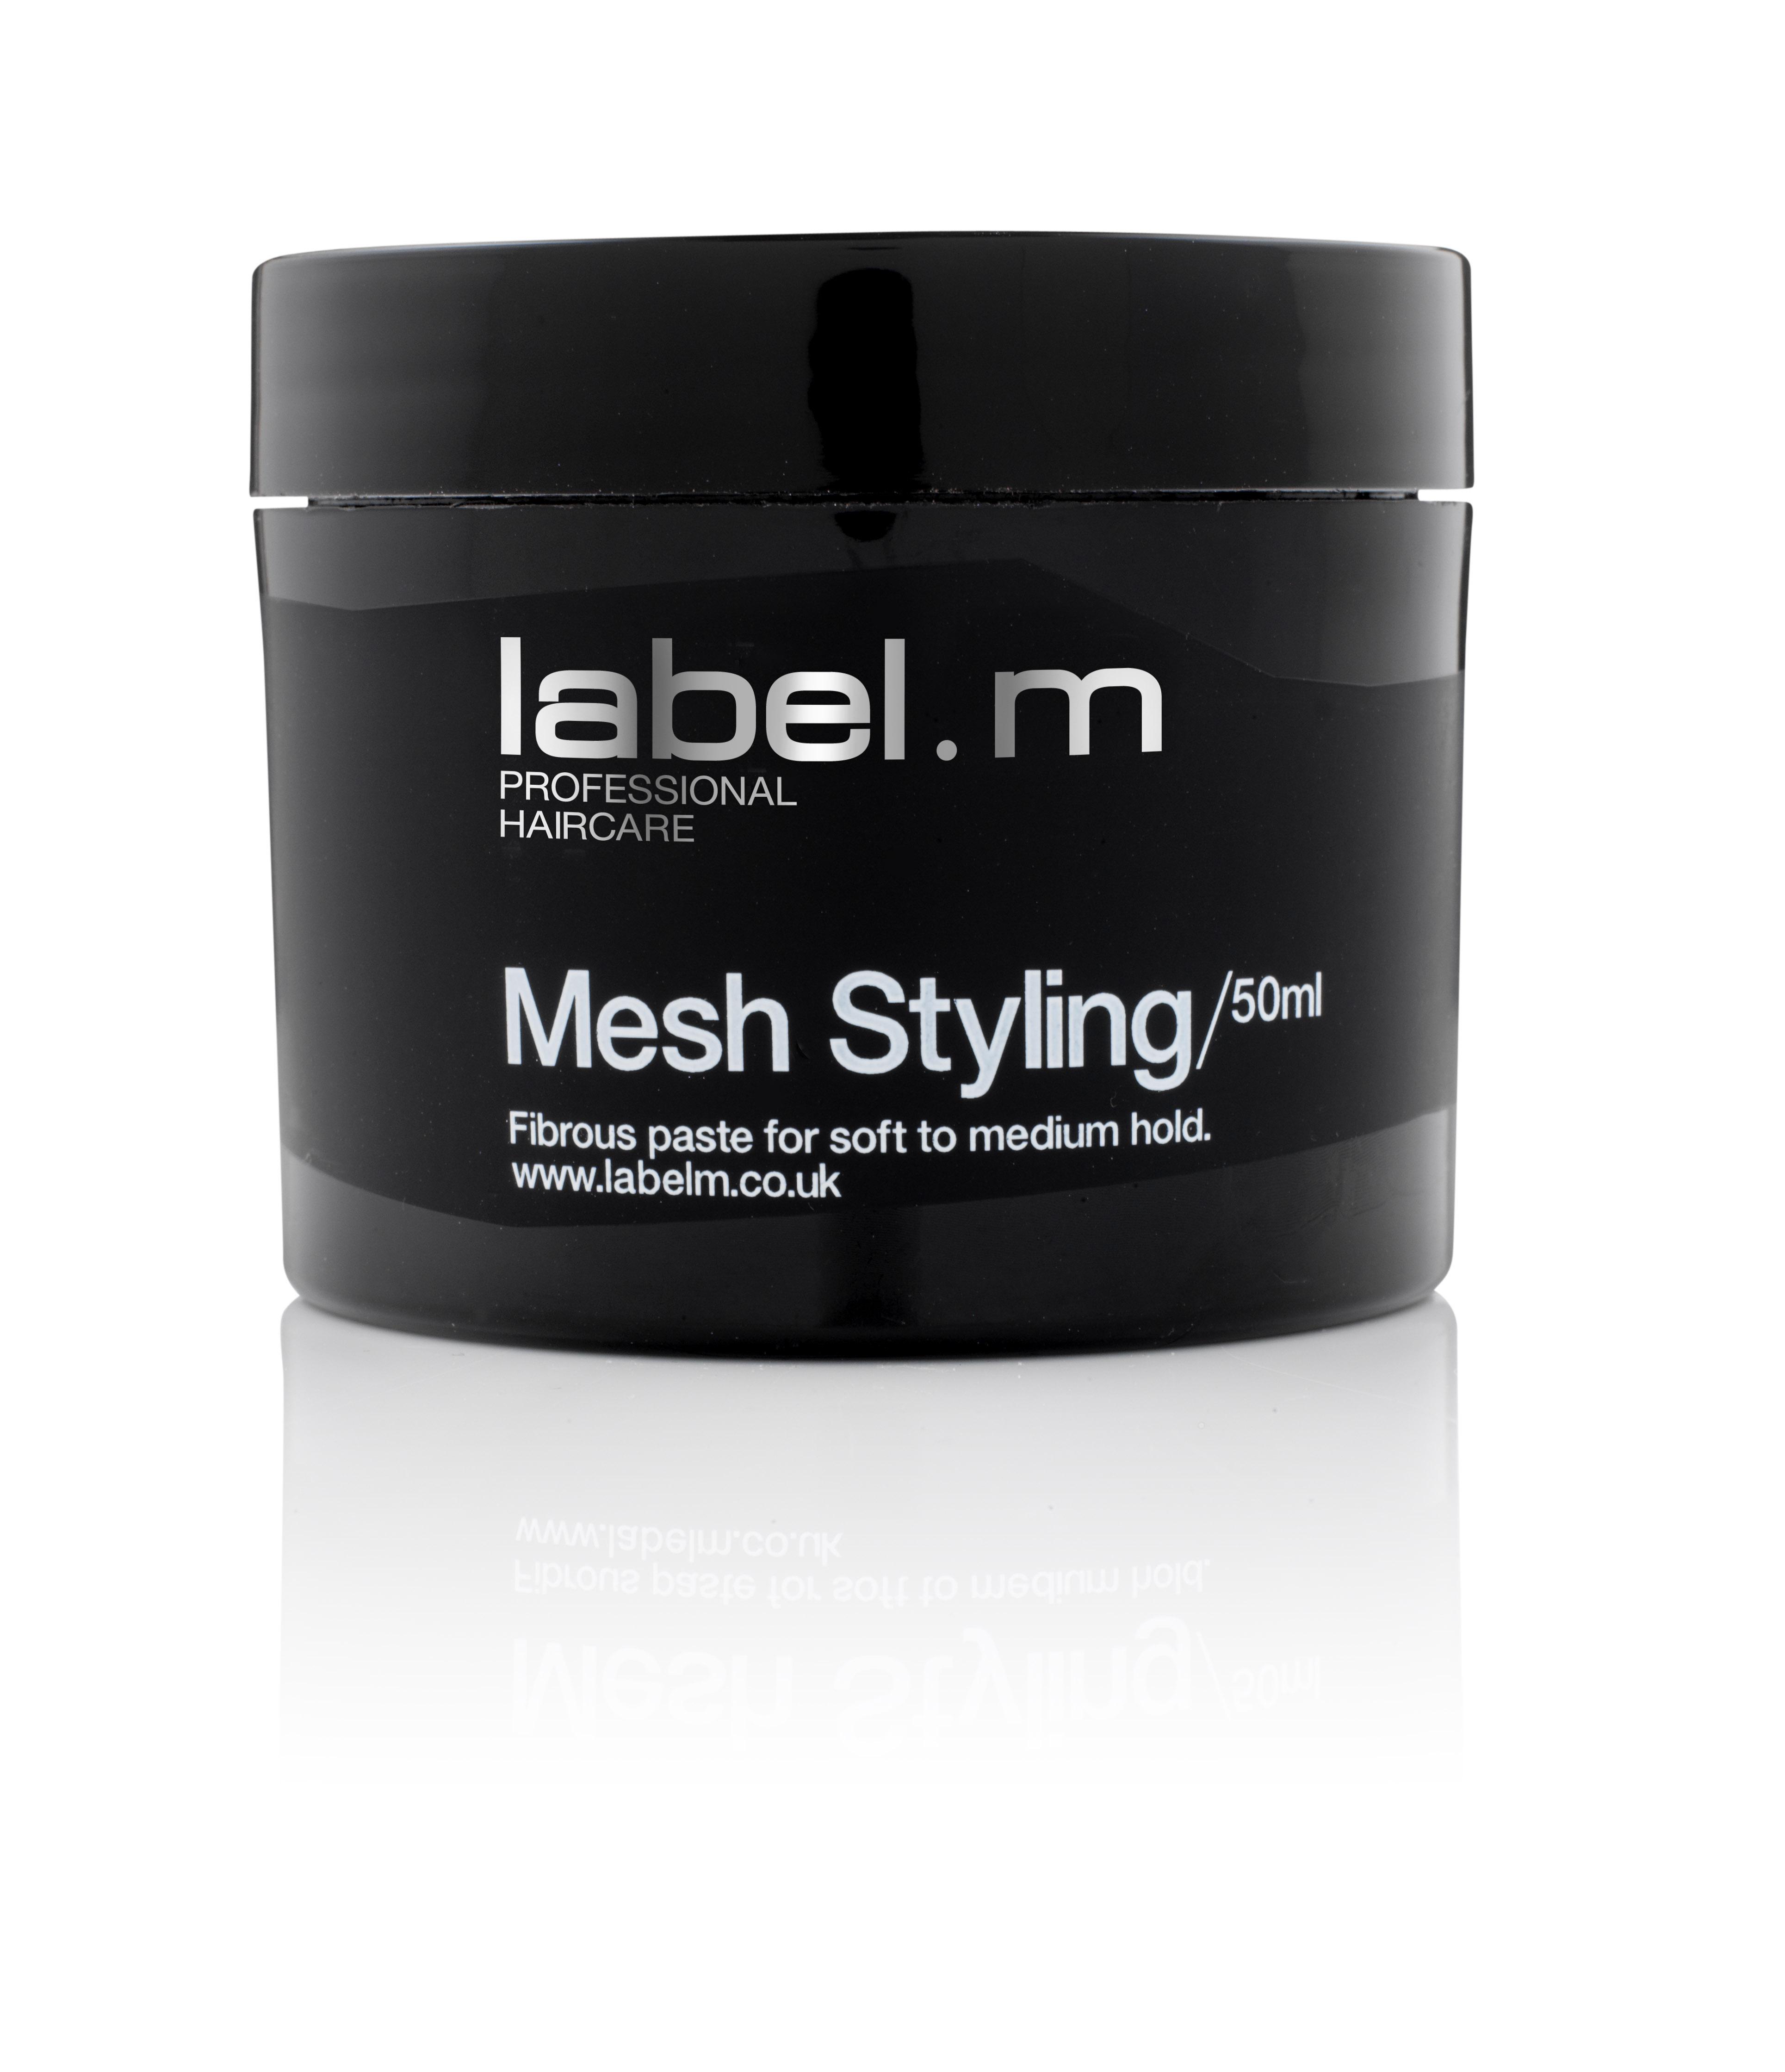 Mesh Styling 50ml